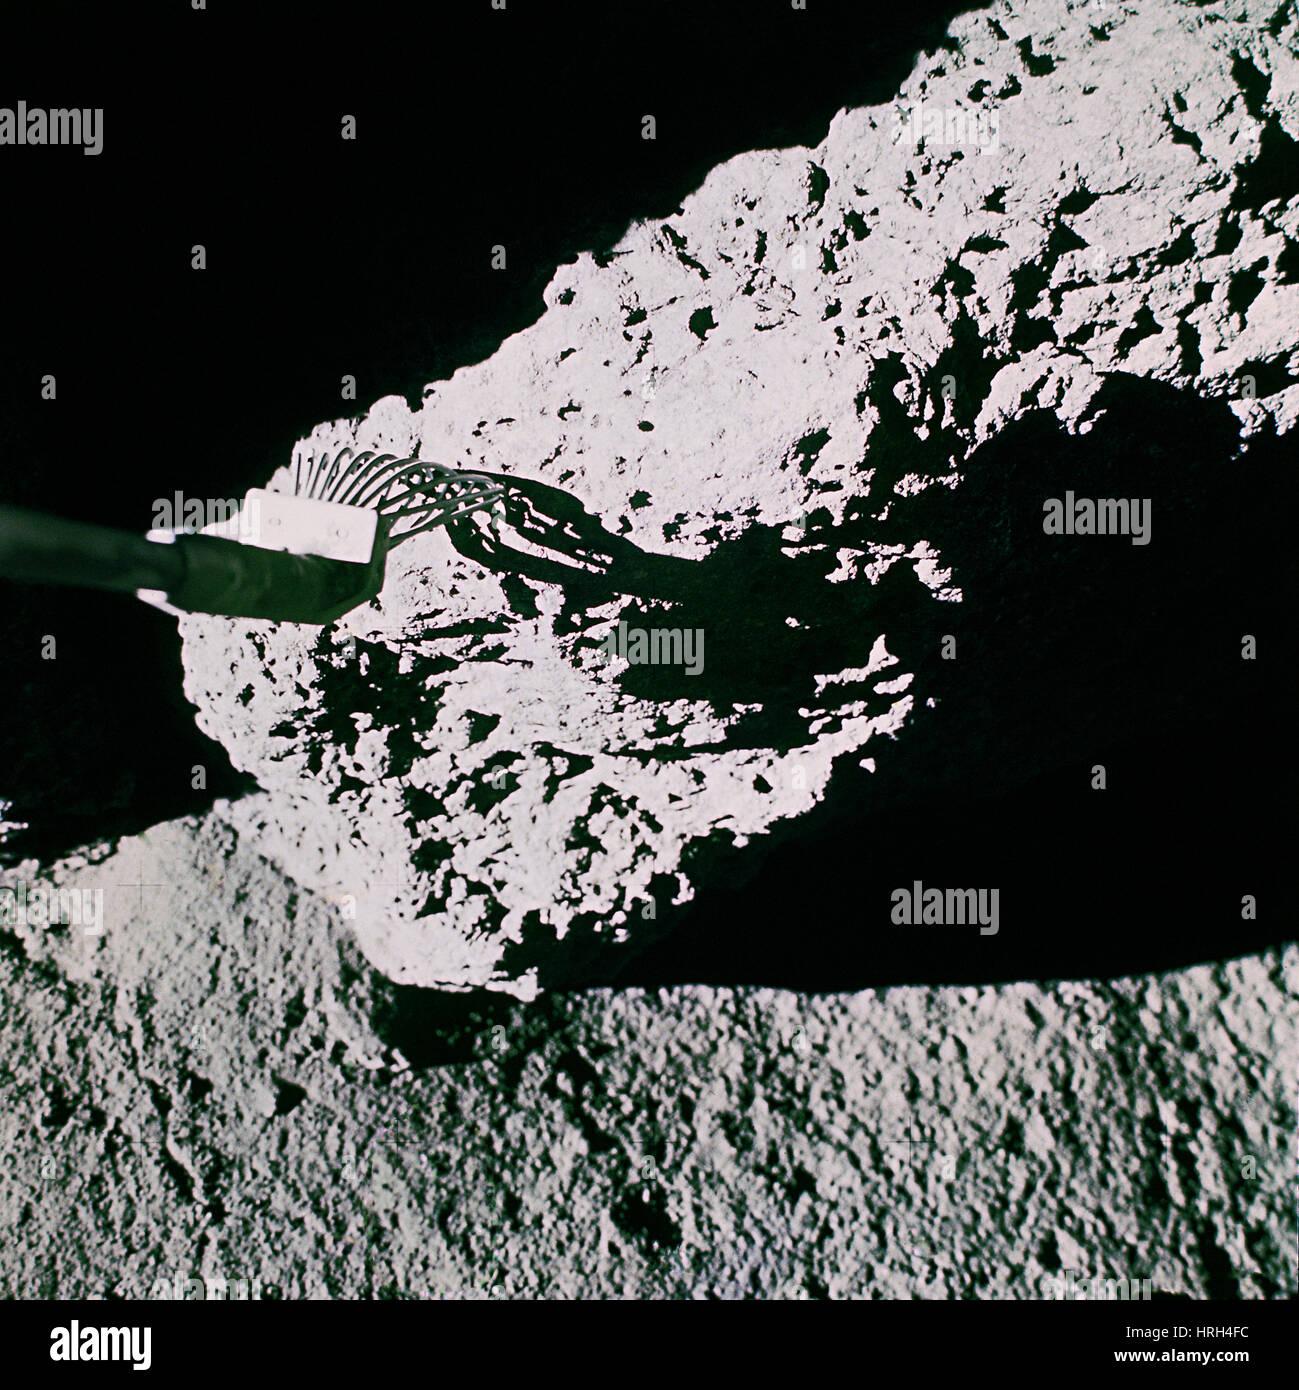 Apollo 15 specimen collection - Stock Image